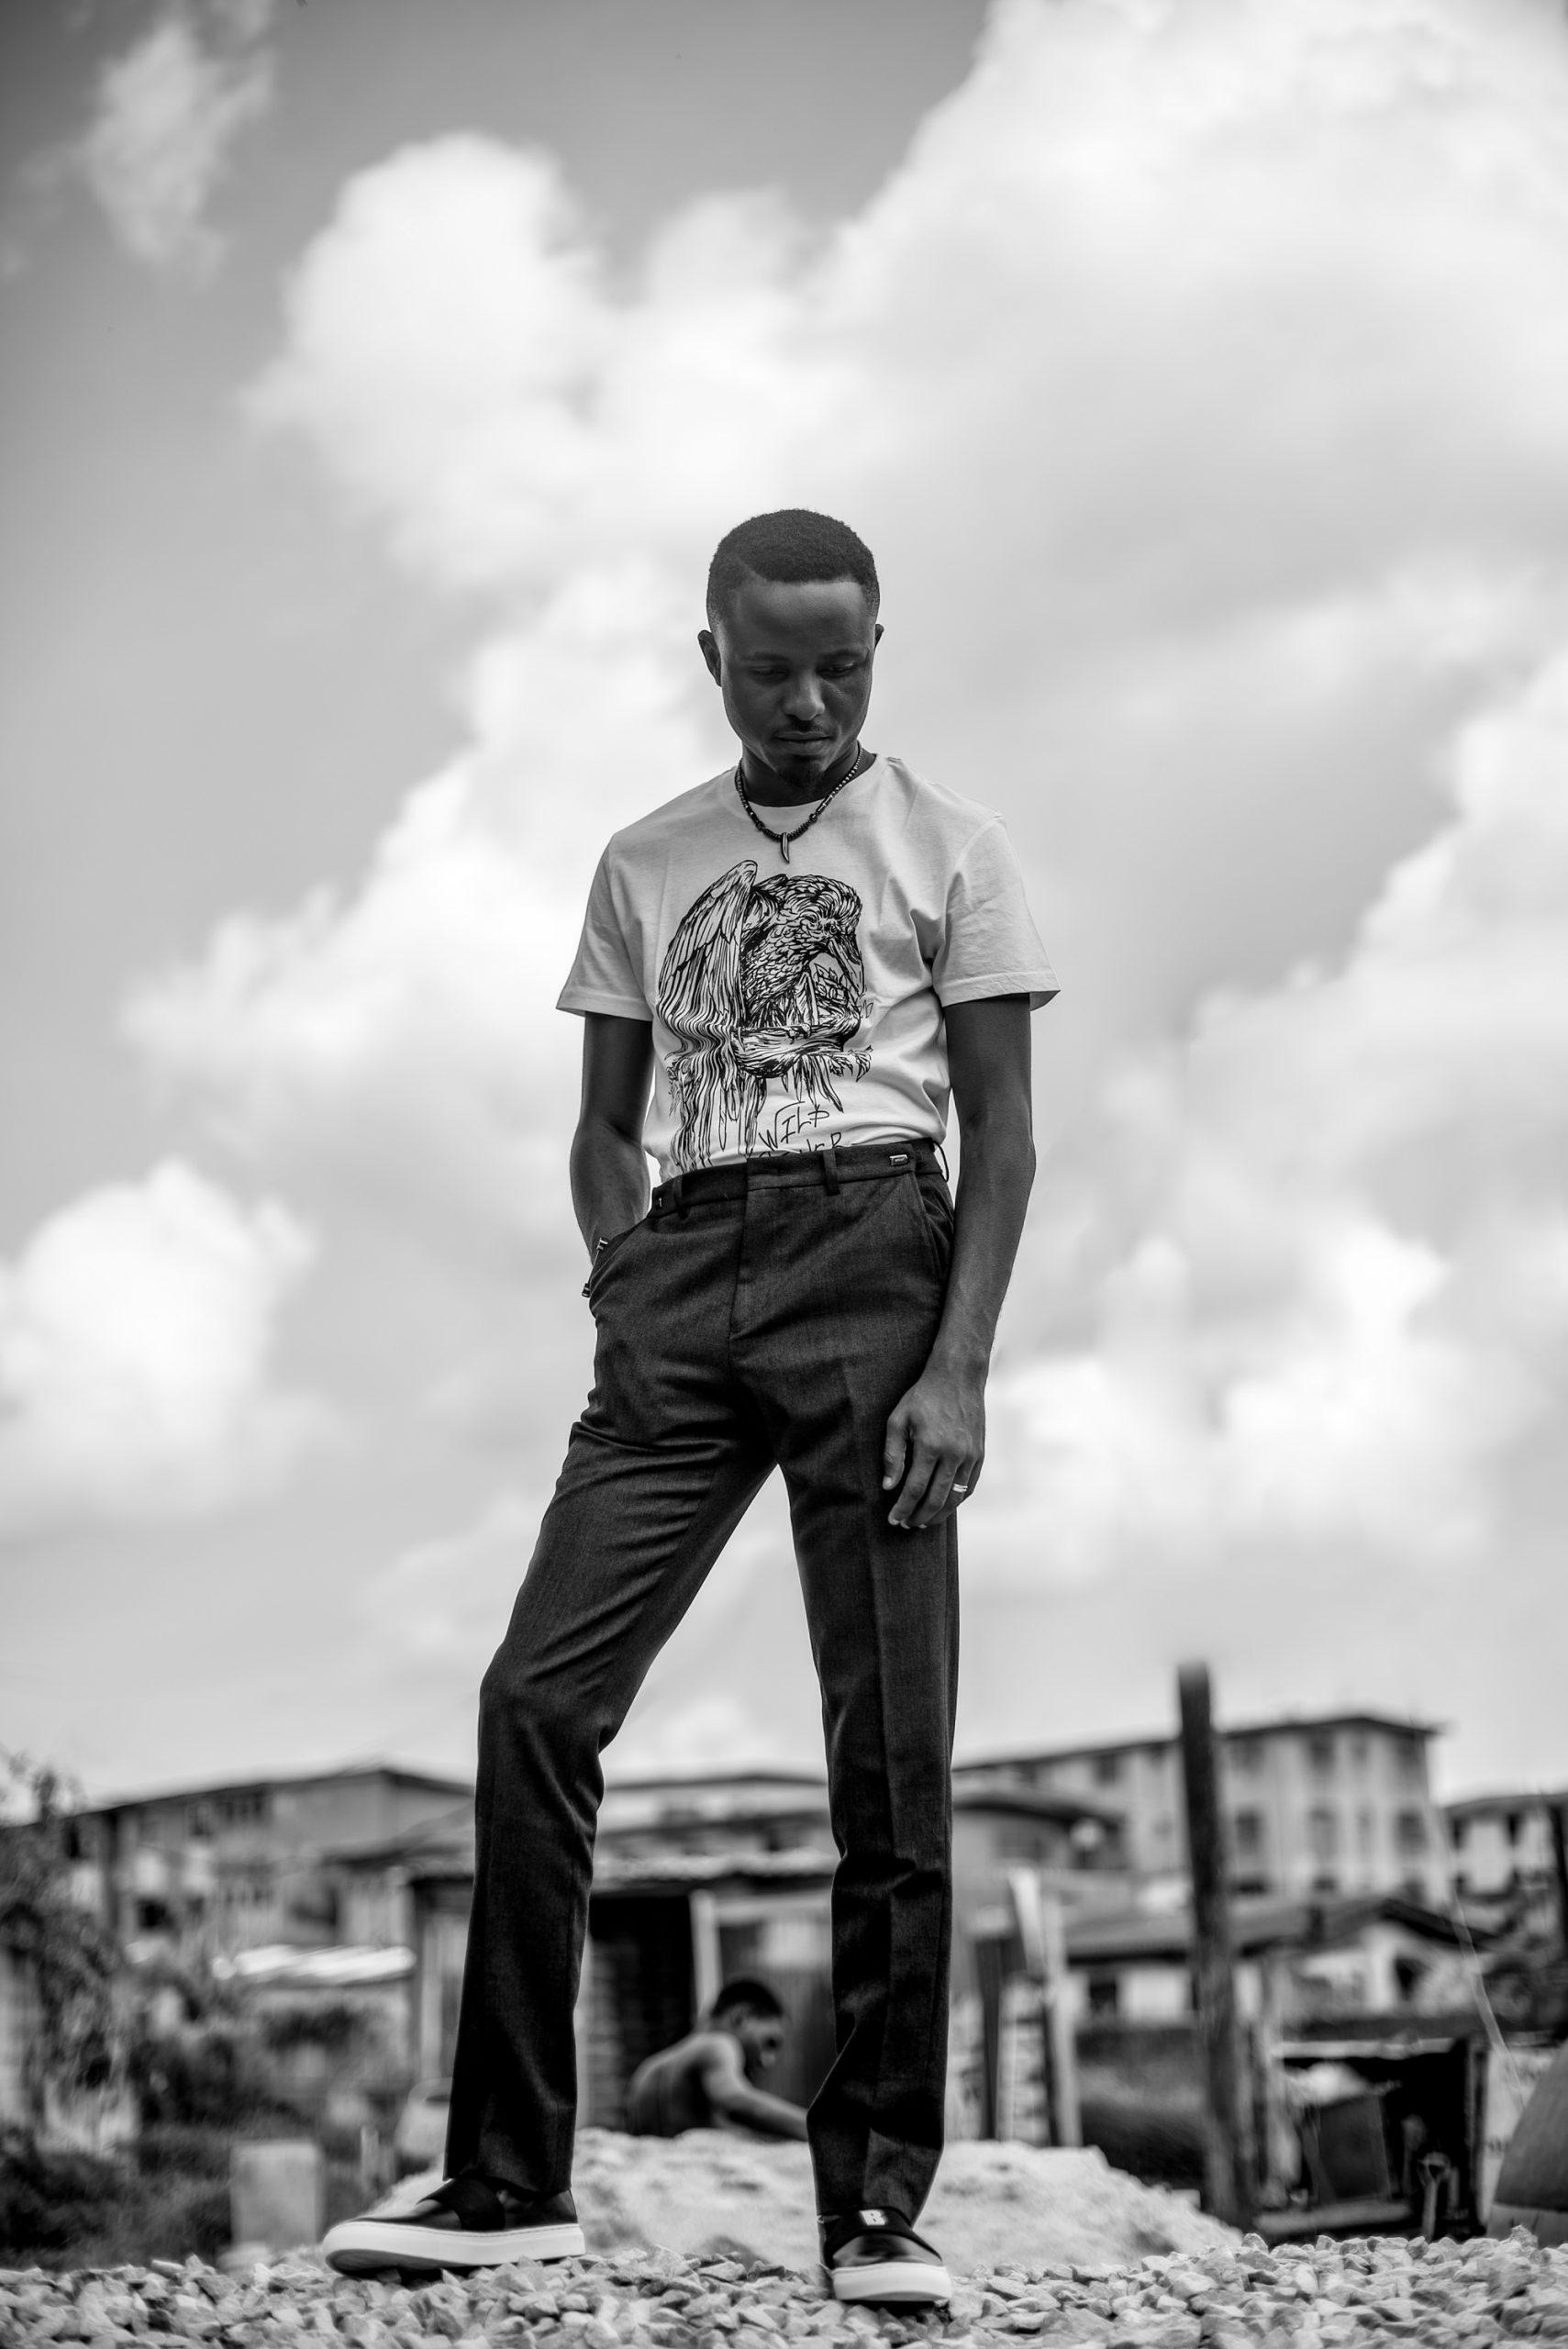 TOPNAIJA STORIES: Gaise Baba, Performing Artist & Creative Entrepreneur